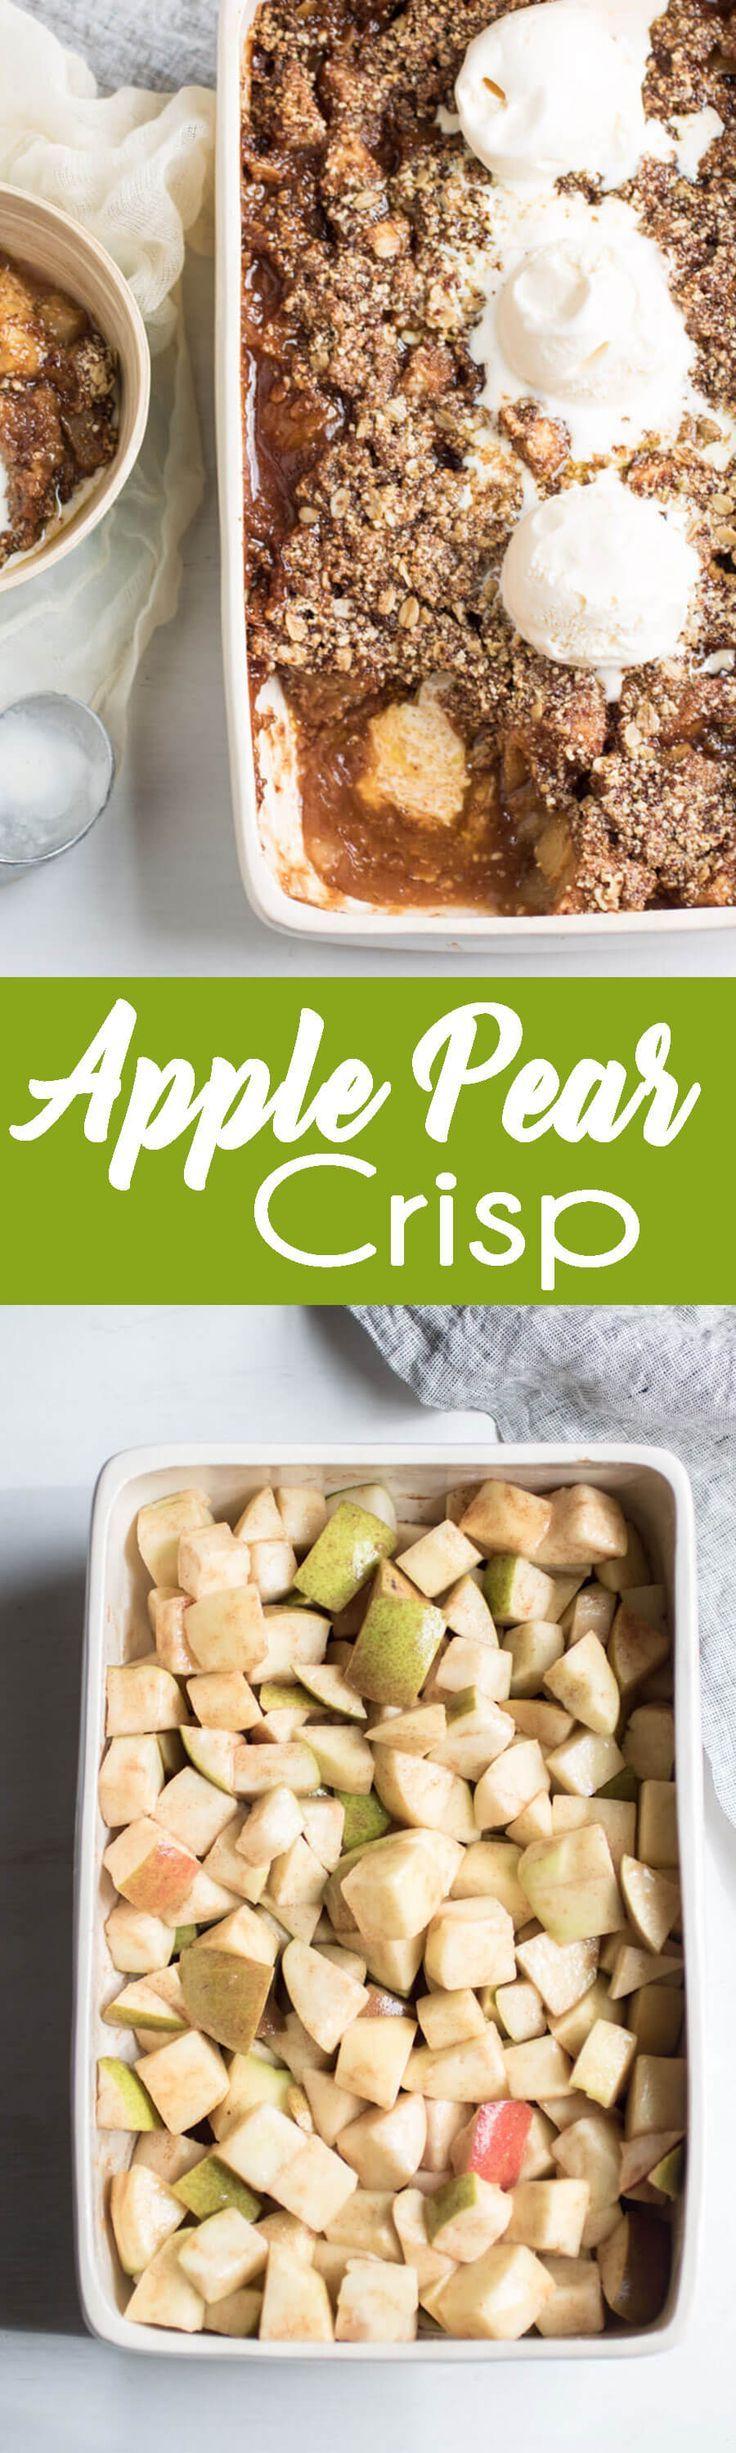 Best 25+ Apple pear crisp ideas on Pinterest | Apple pear ...